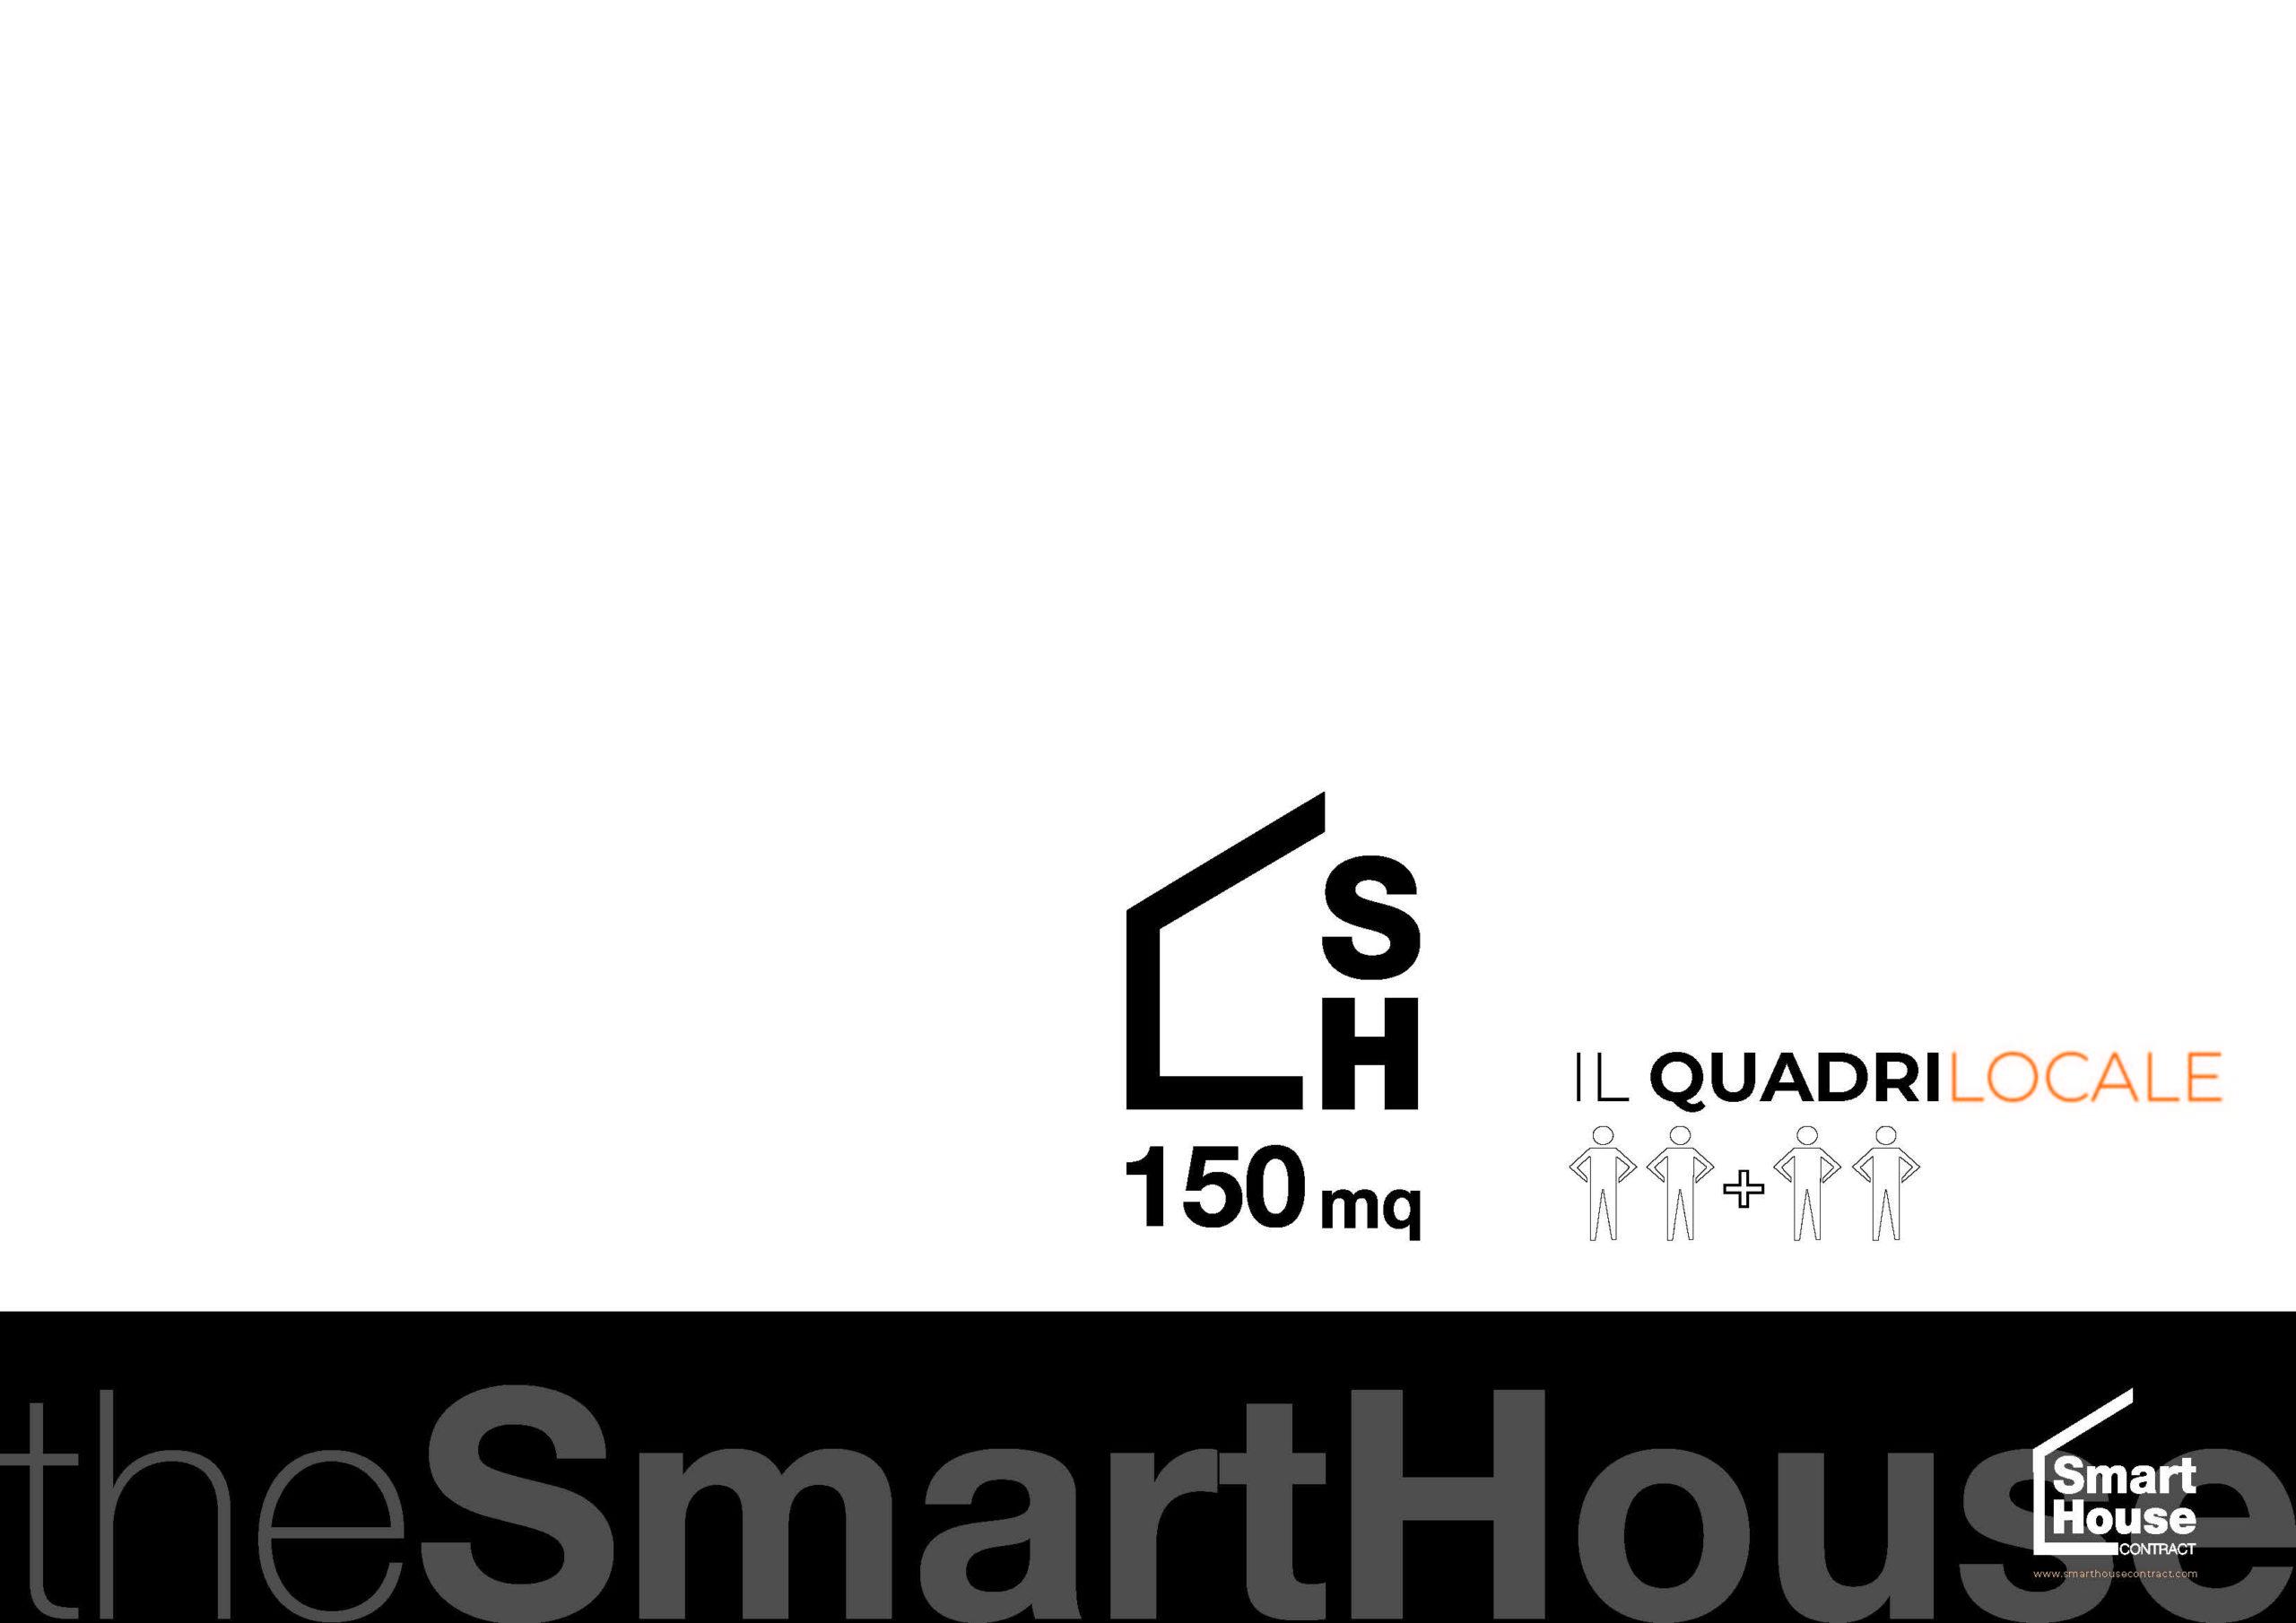 SmartHouse 150mq